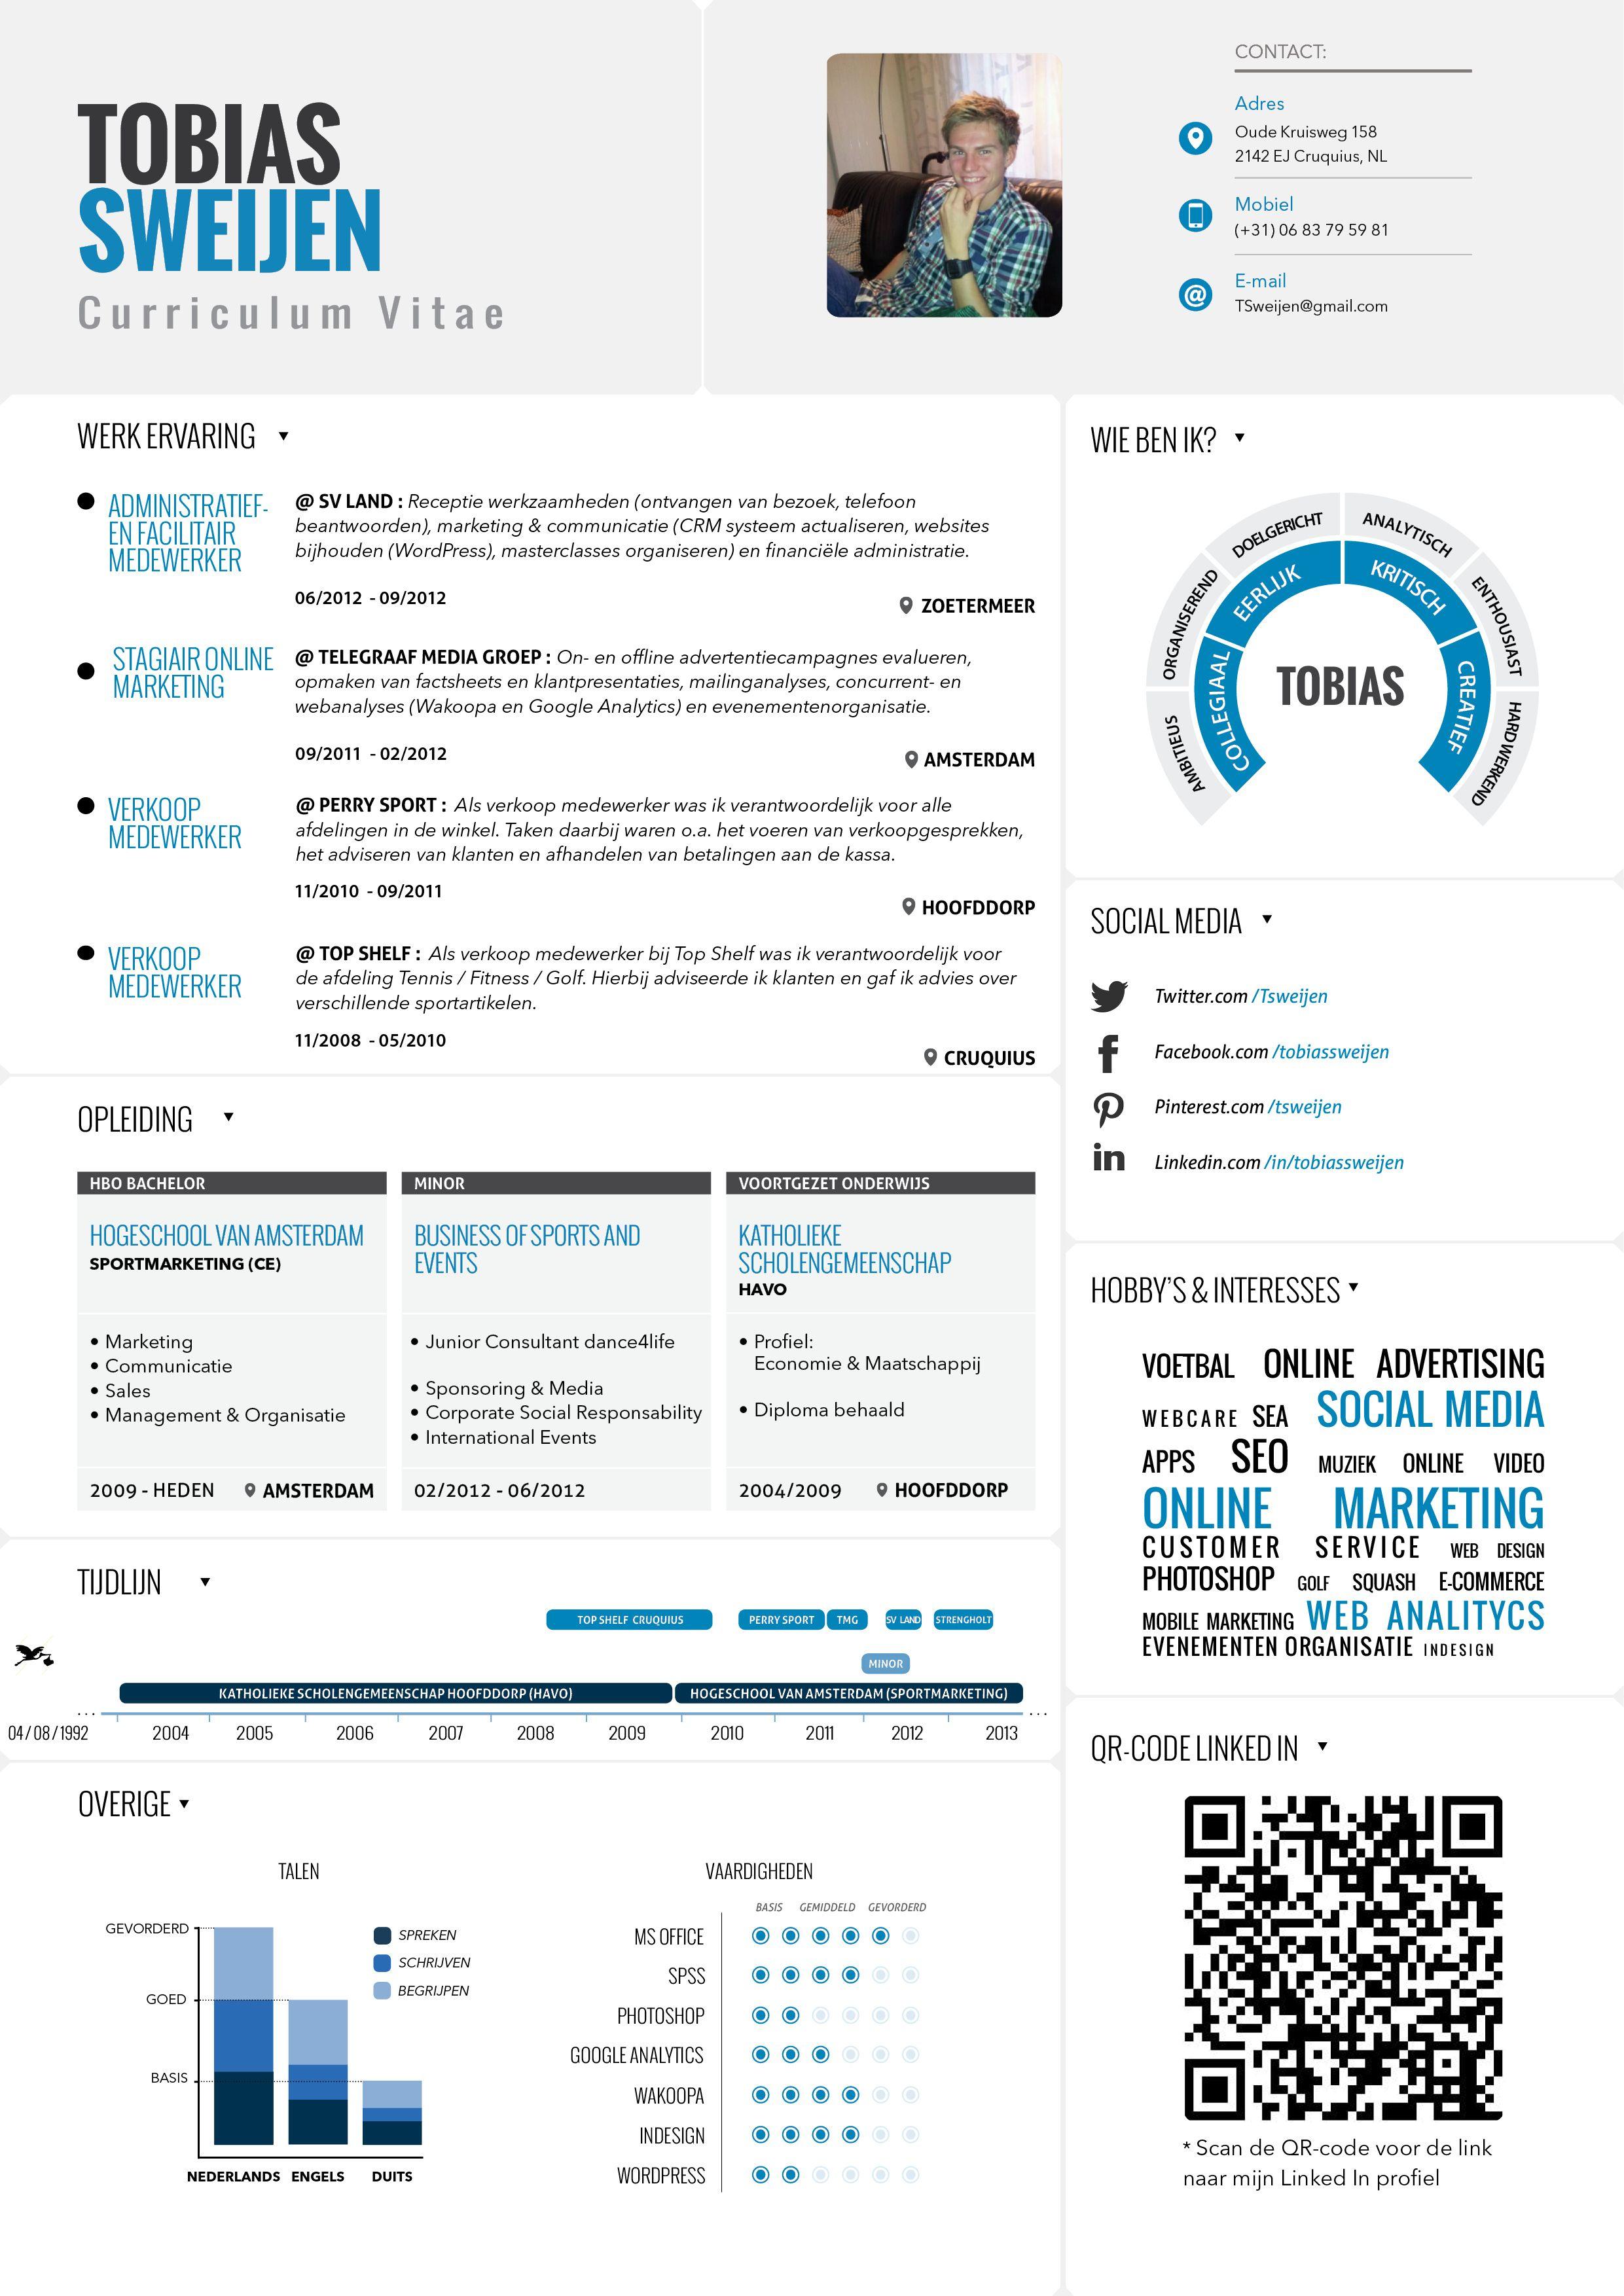 curriculum vitae resume infographic tobias sweijen